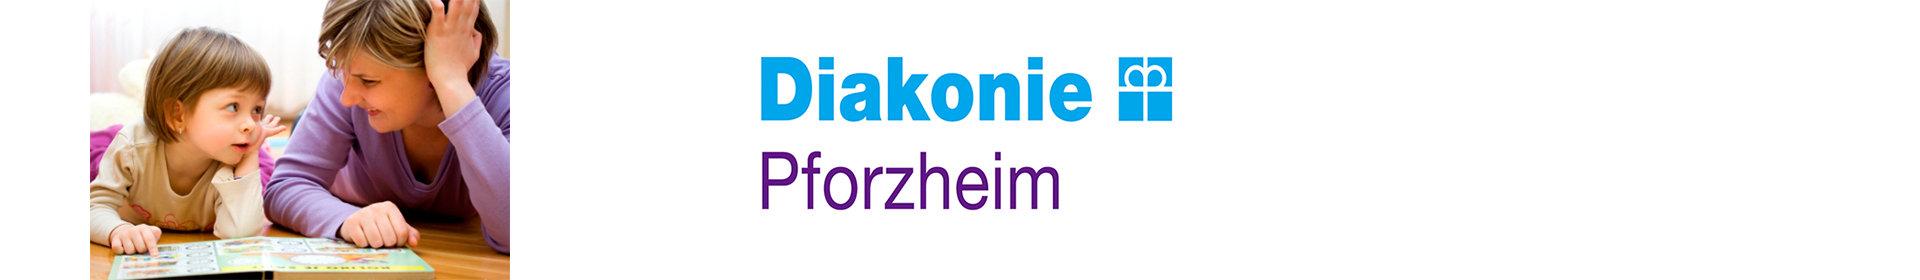 Diakonie Pforzheim / Quelle: ©Diakonie Pforzheim